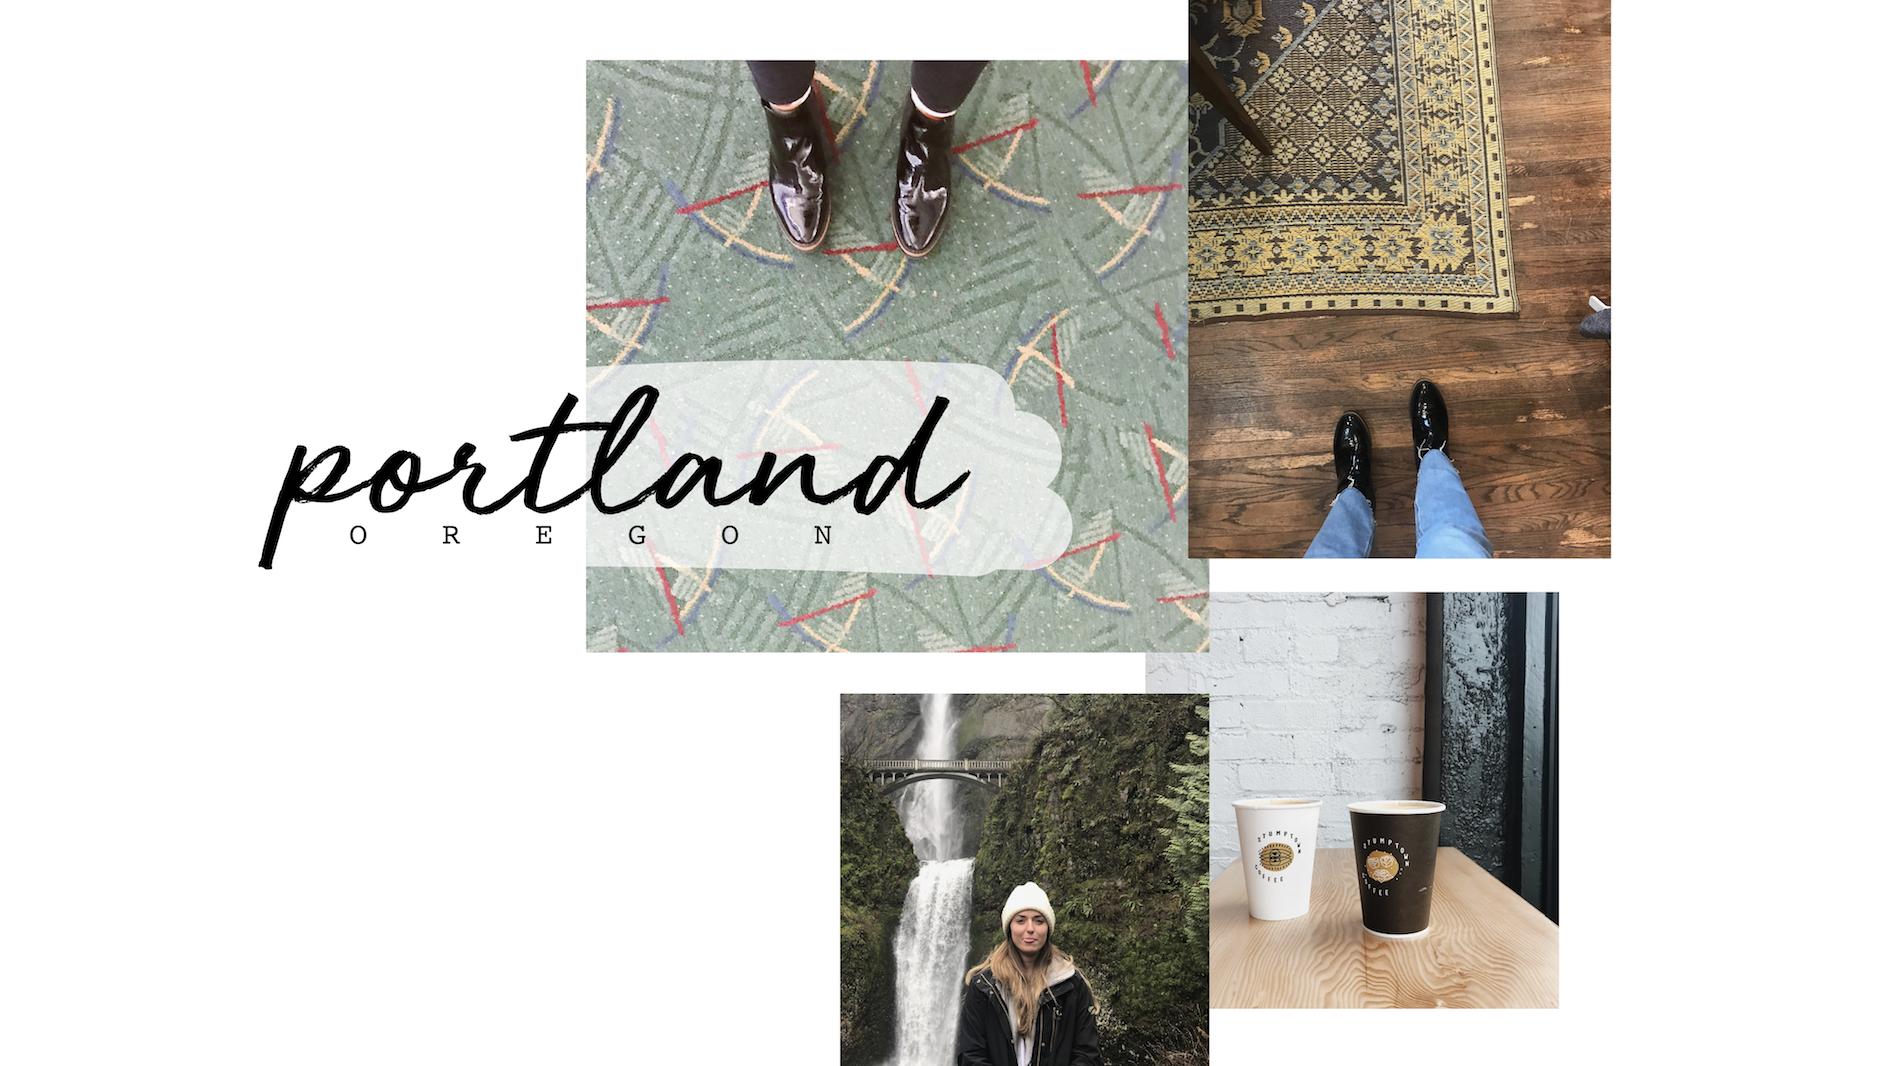 Portland guide